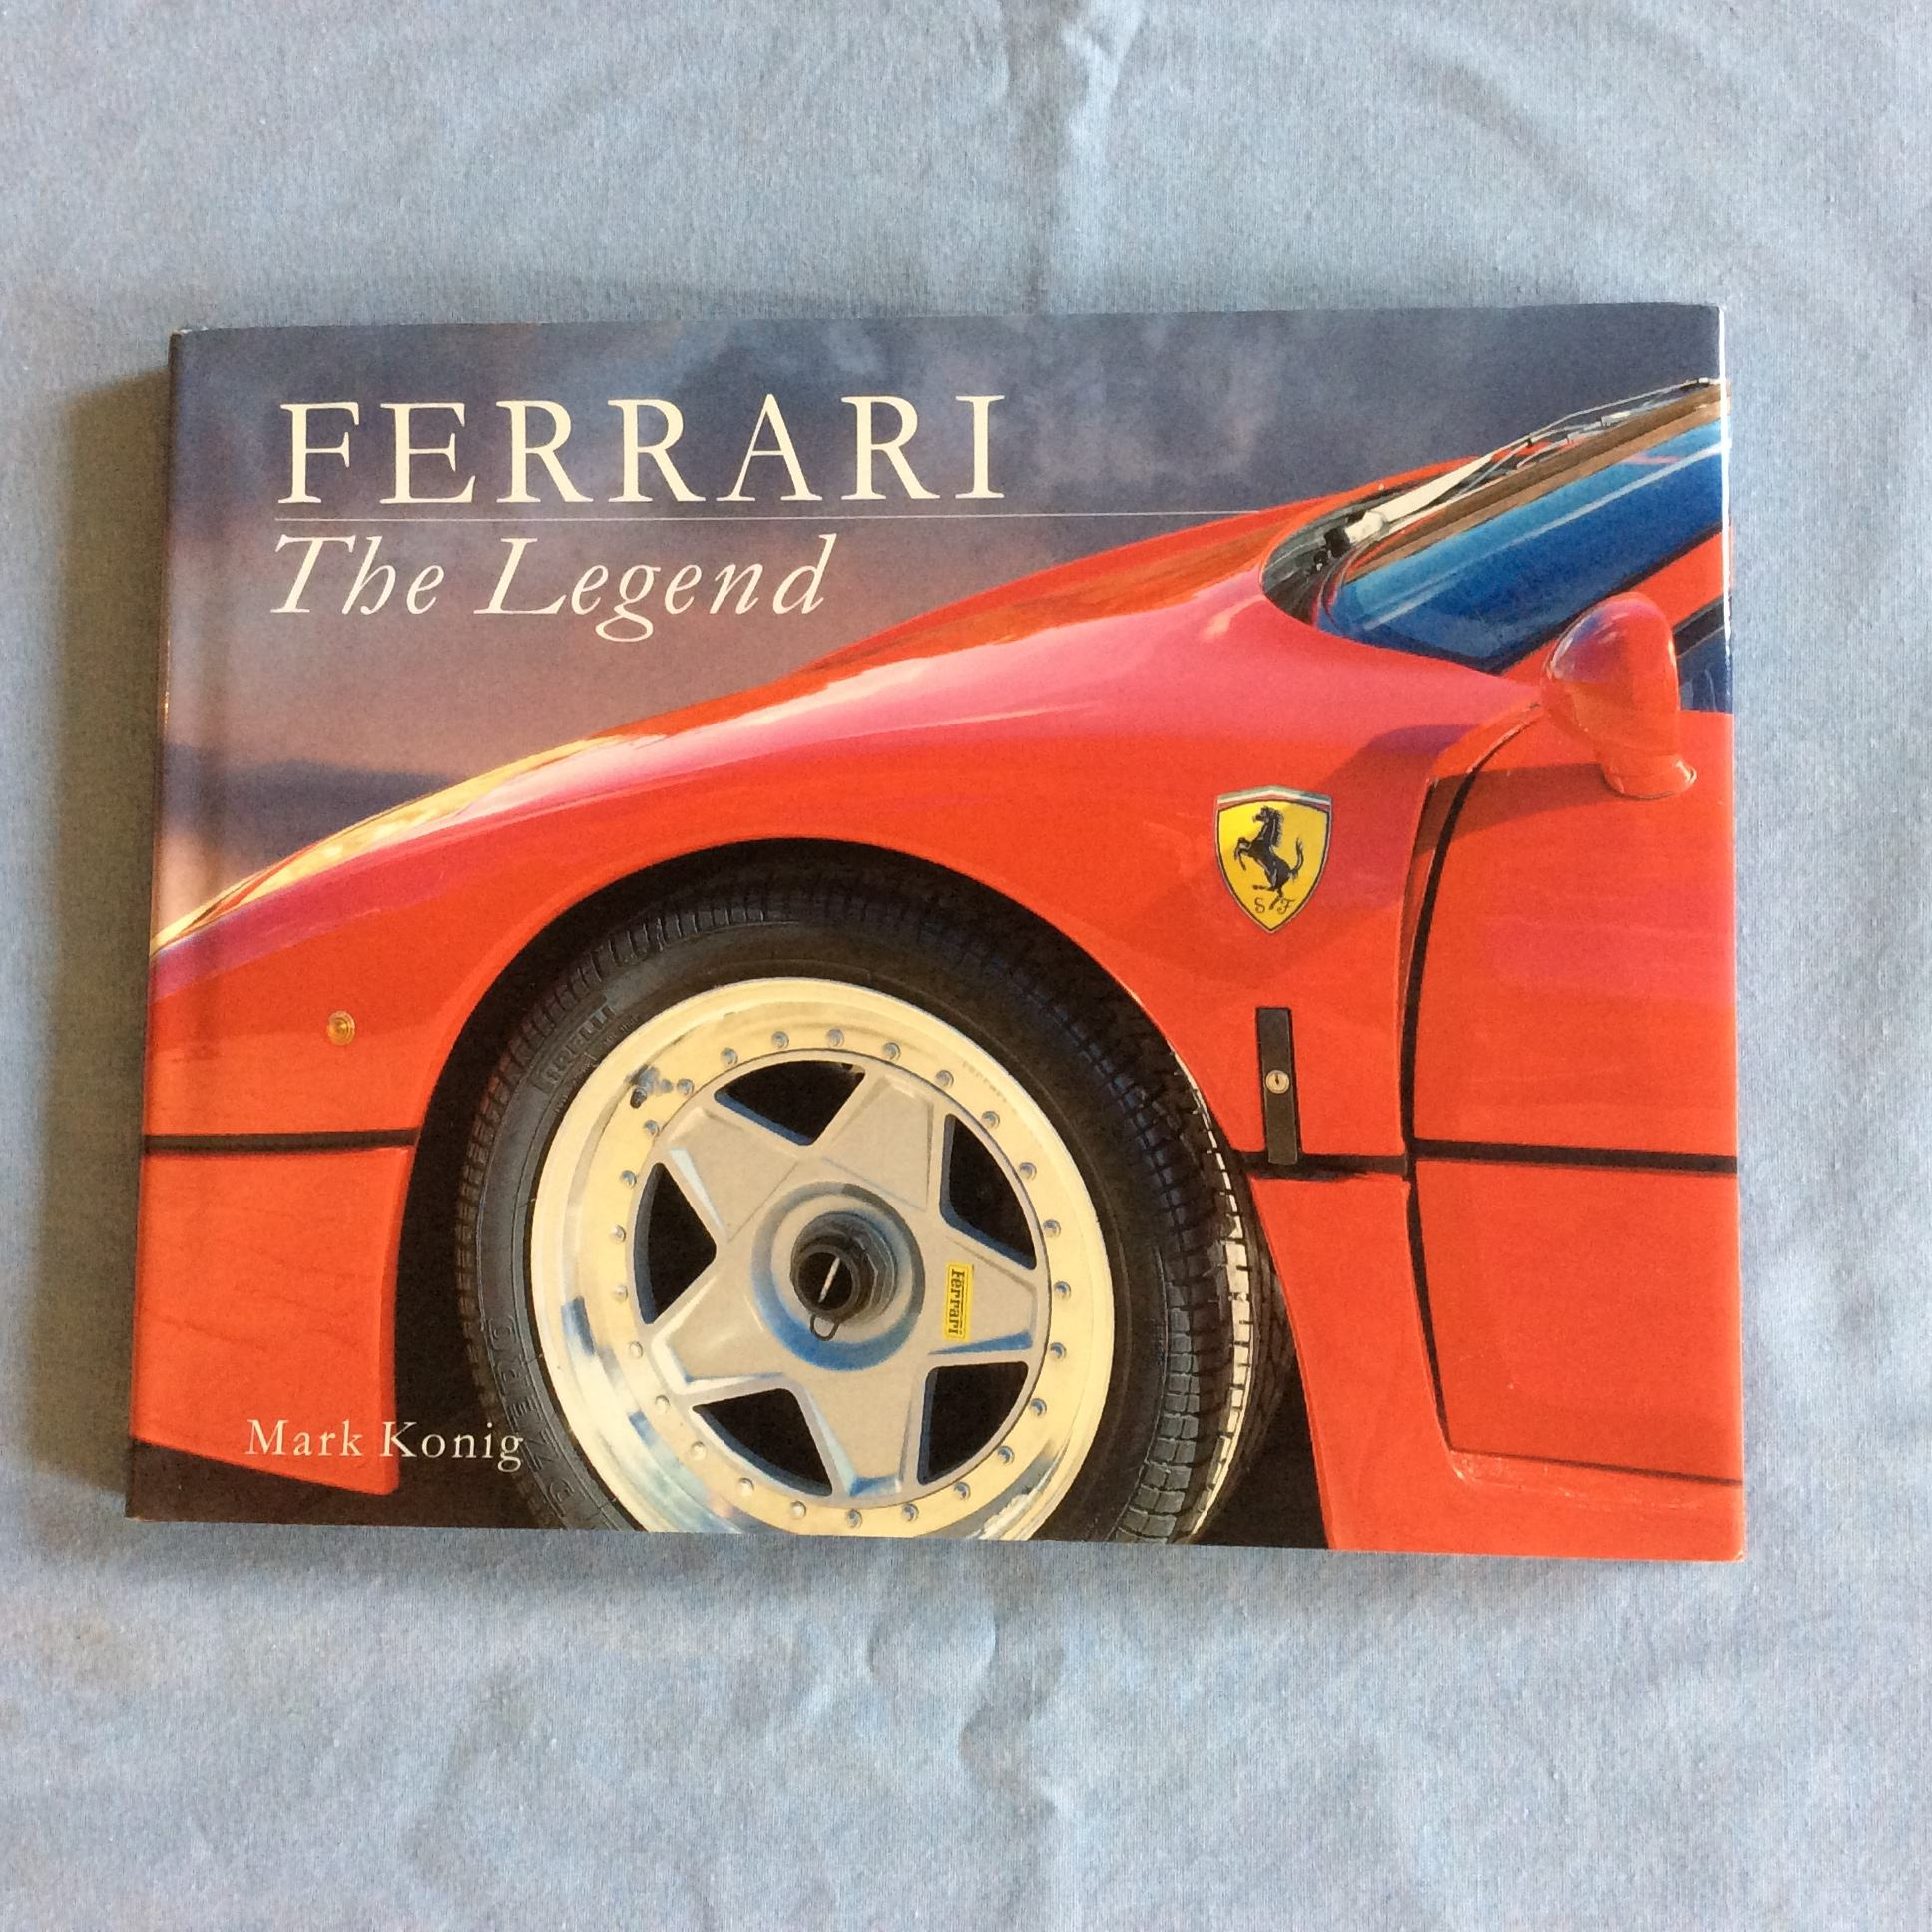 Ferrari Memorabilia: Other Cars, Memorabilia Ferrari The Legend Book